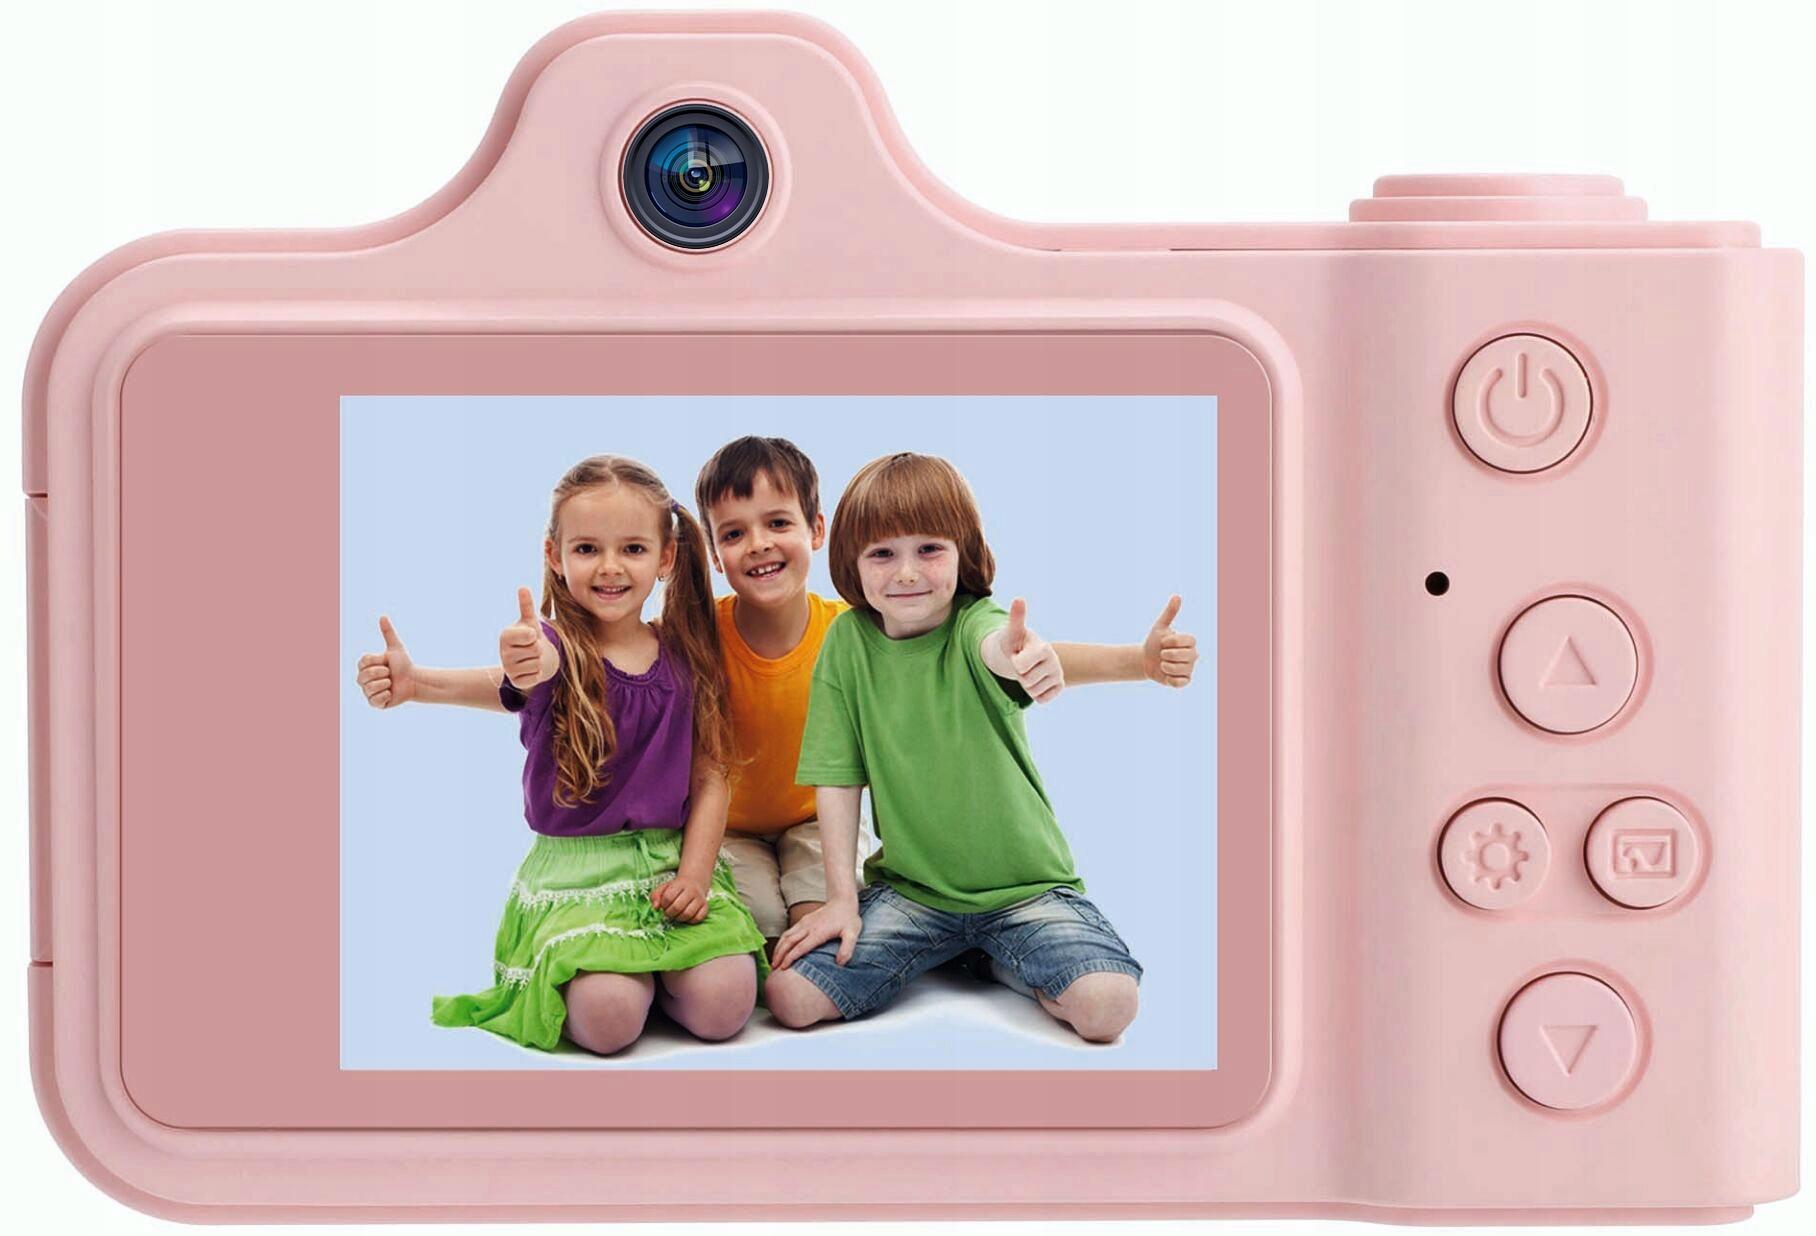 Item CAMERA DIGITAL CAMERA FOR KIDS +STICKERS + LEASH